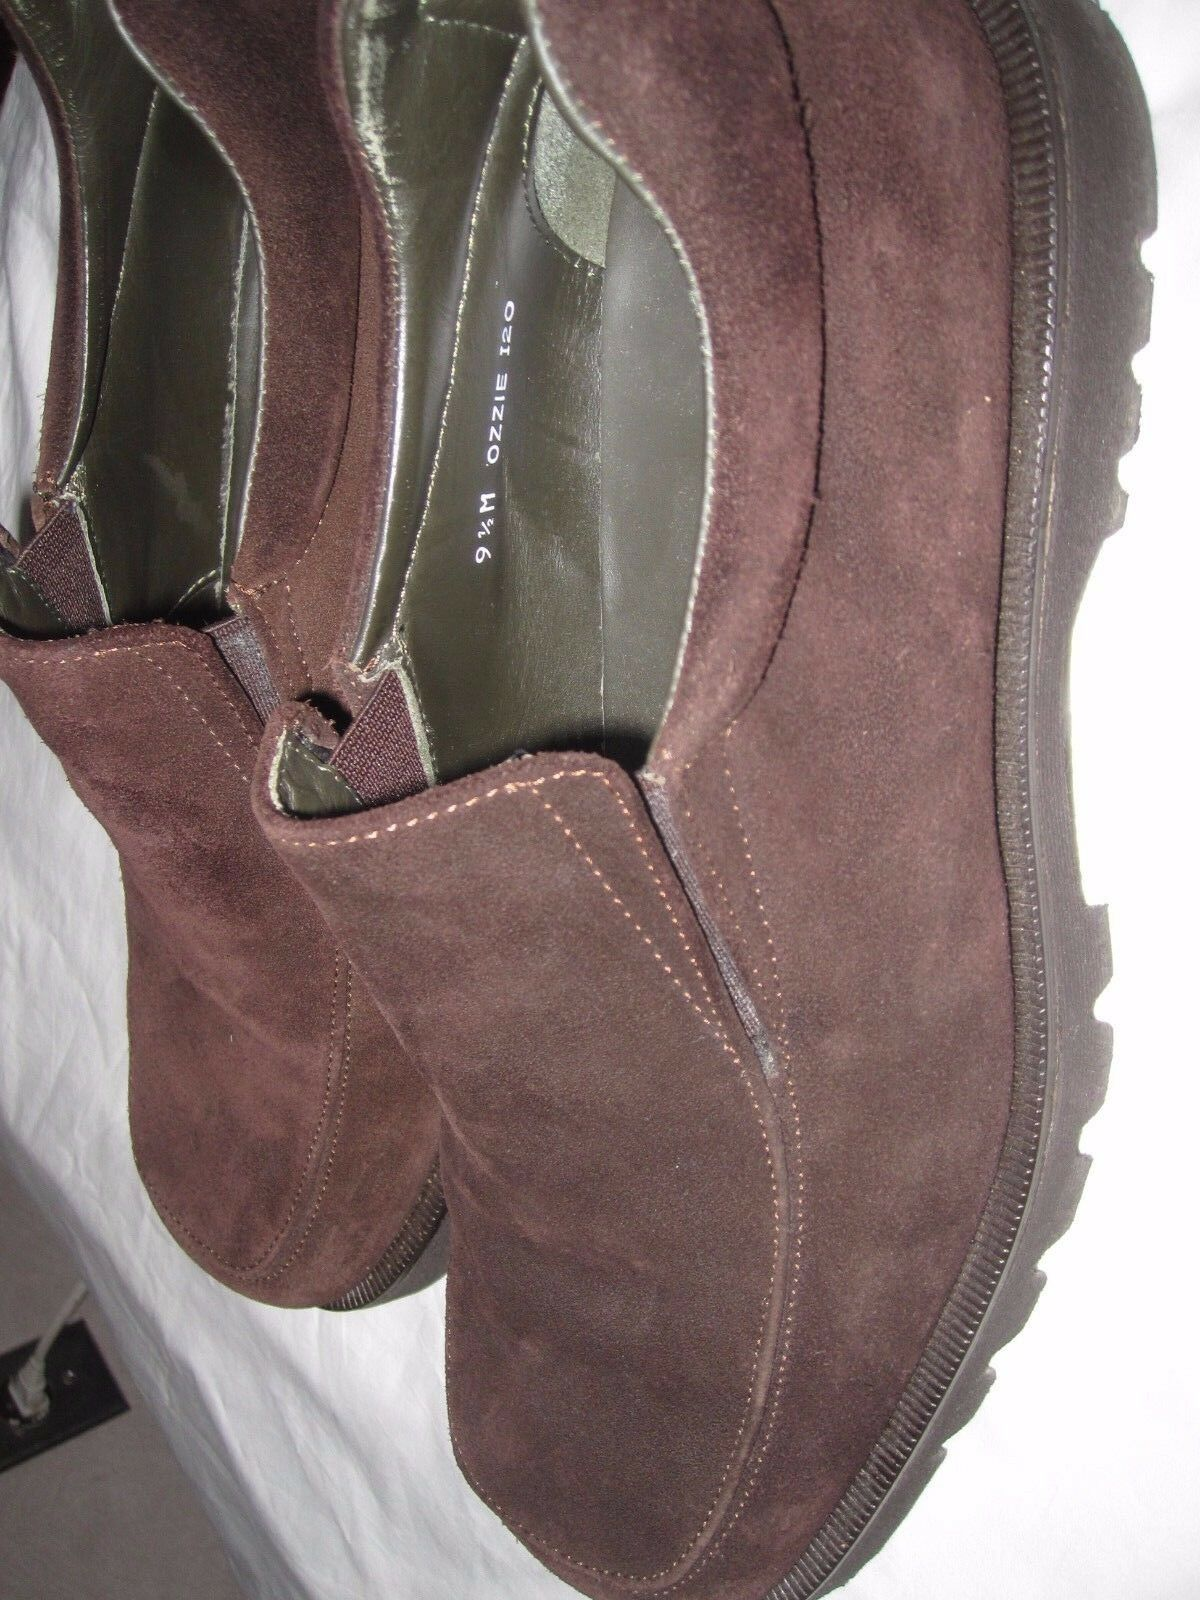 Donald J Pliner Ozzie Italy Tassel Loafers Brown Suede Moccasin Slip On Sz 8.5 Scarpe classiche da uomo